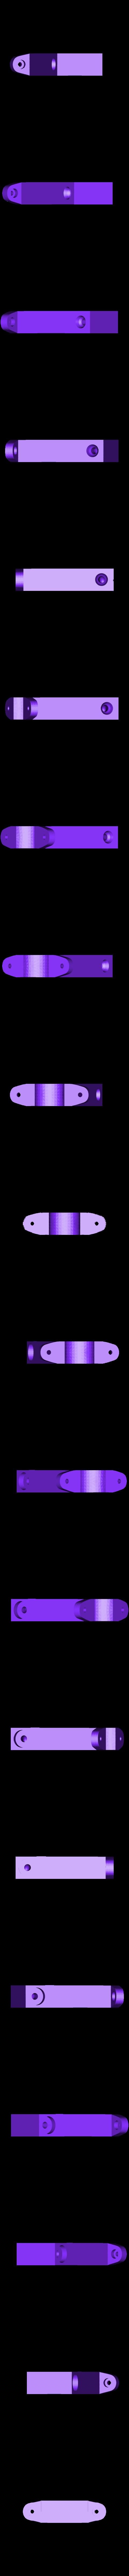 Upper_Frame.STL Download free STL file Working Oscillating Steam Engine MKI • Object to 3D print, billythemighty3Dprinter